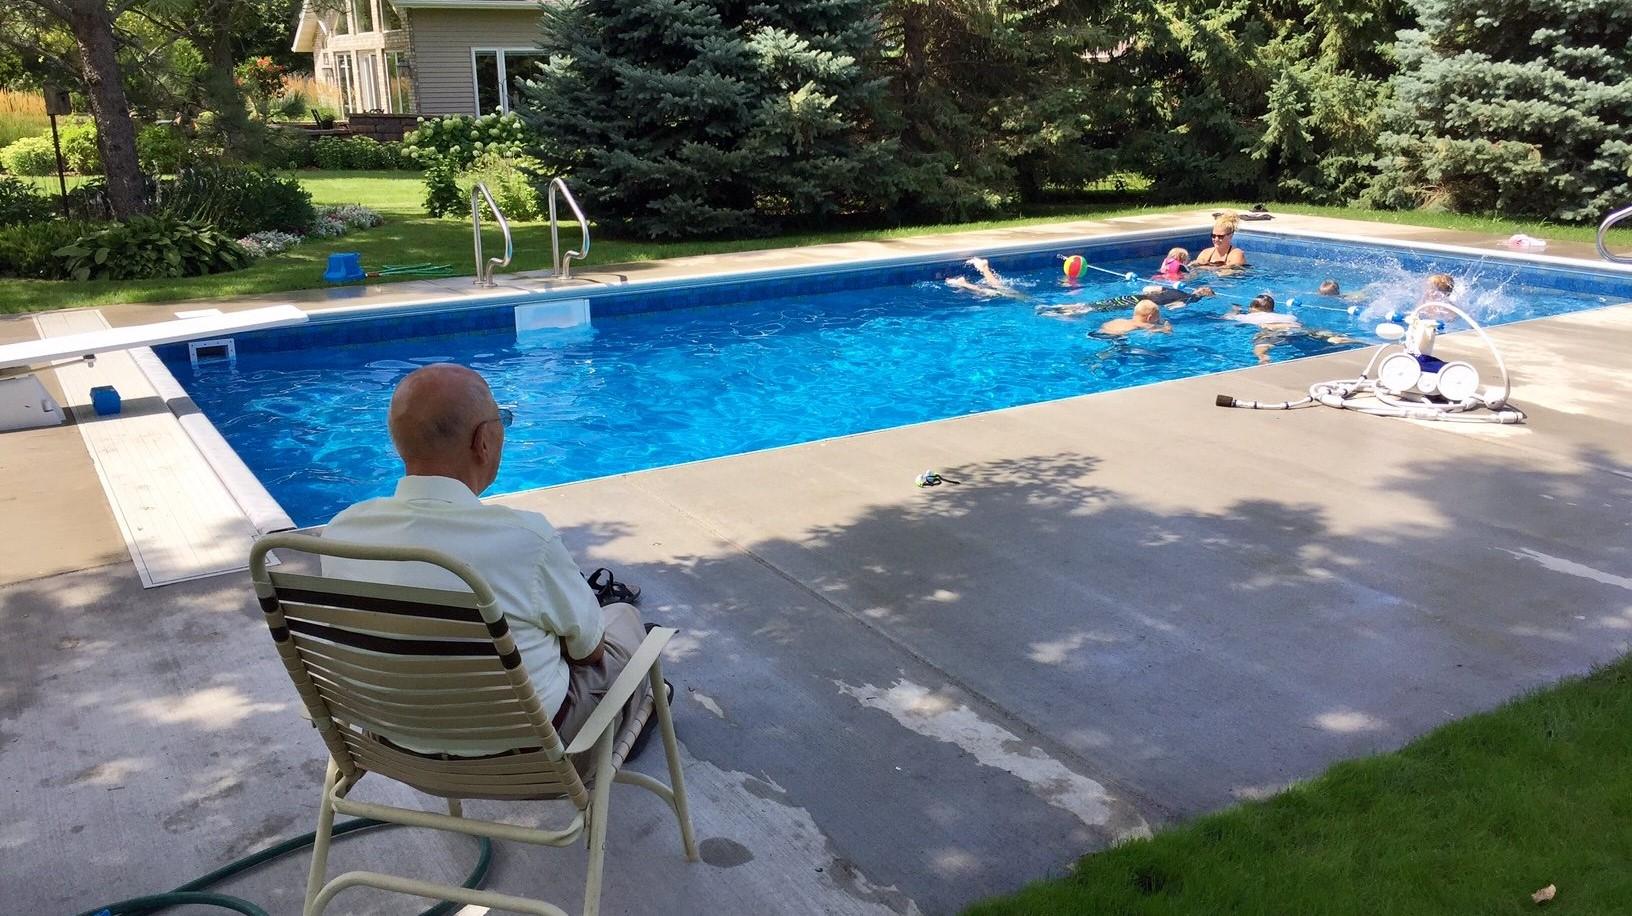 94 year old puts in pool for neighborhood kids kare11 com